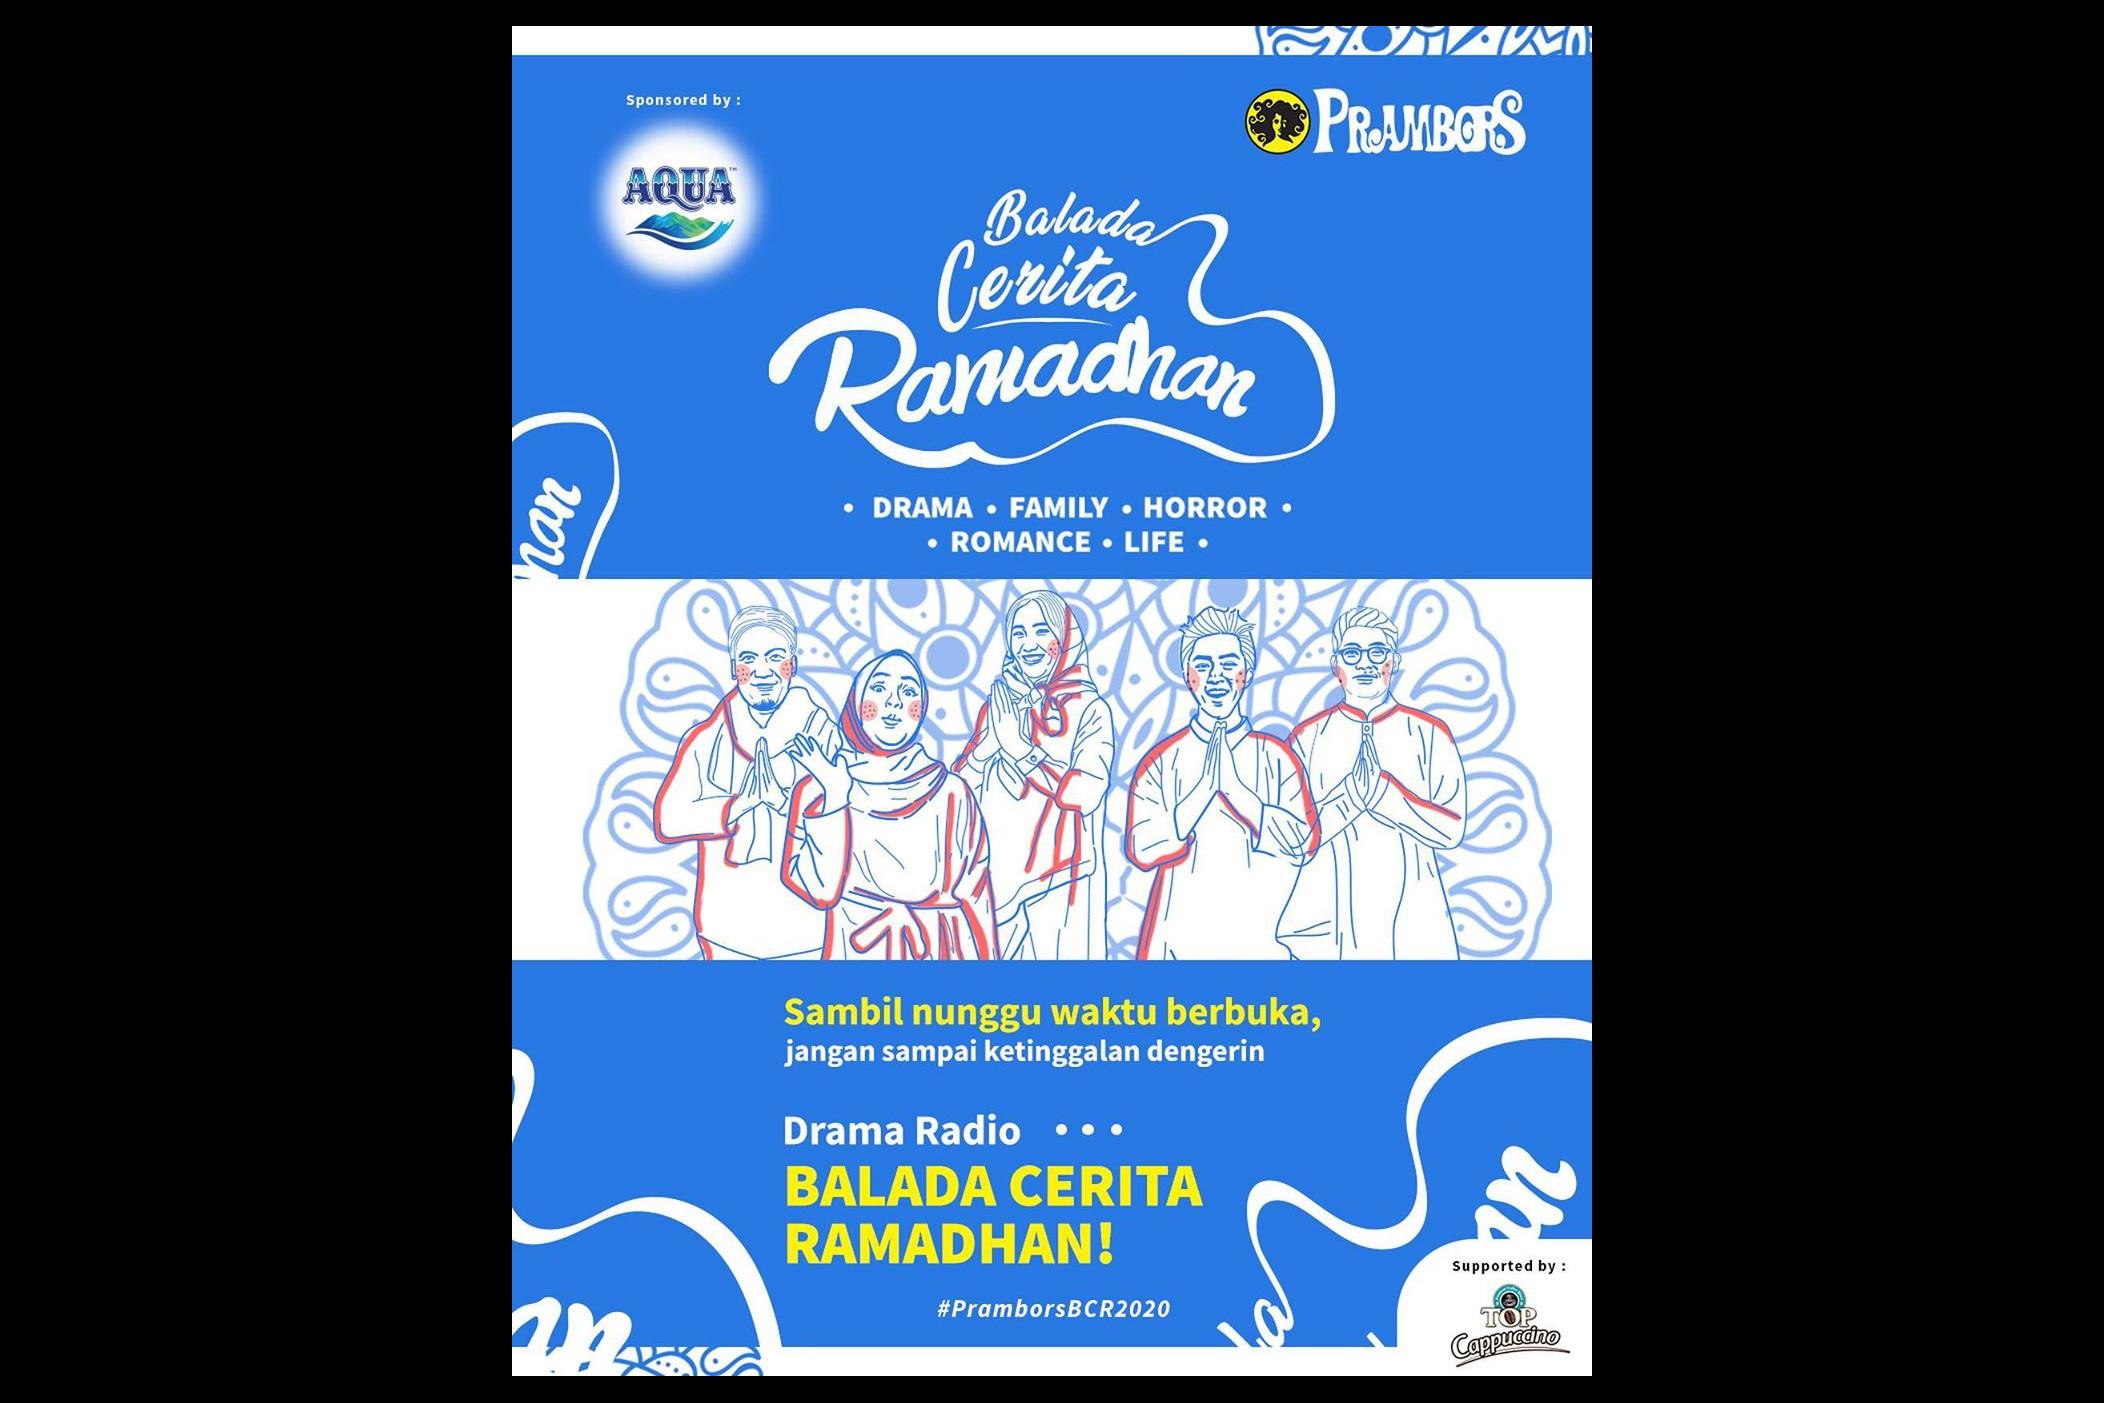 Kejutan Ramadhan Prambors, suguhkan drama radio & hadiah jutaan rupiah